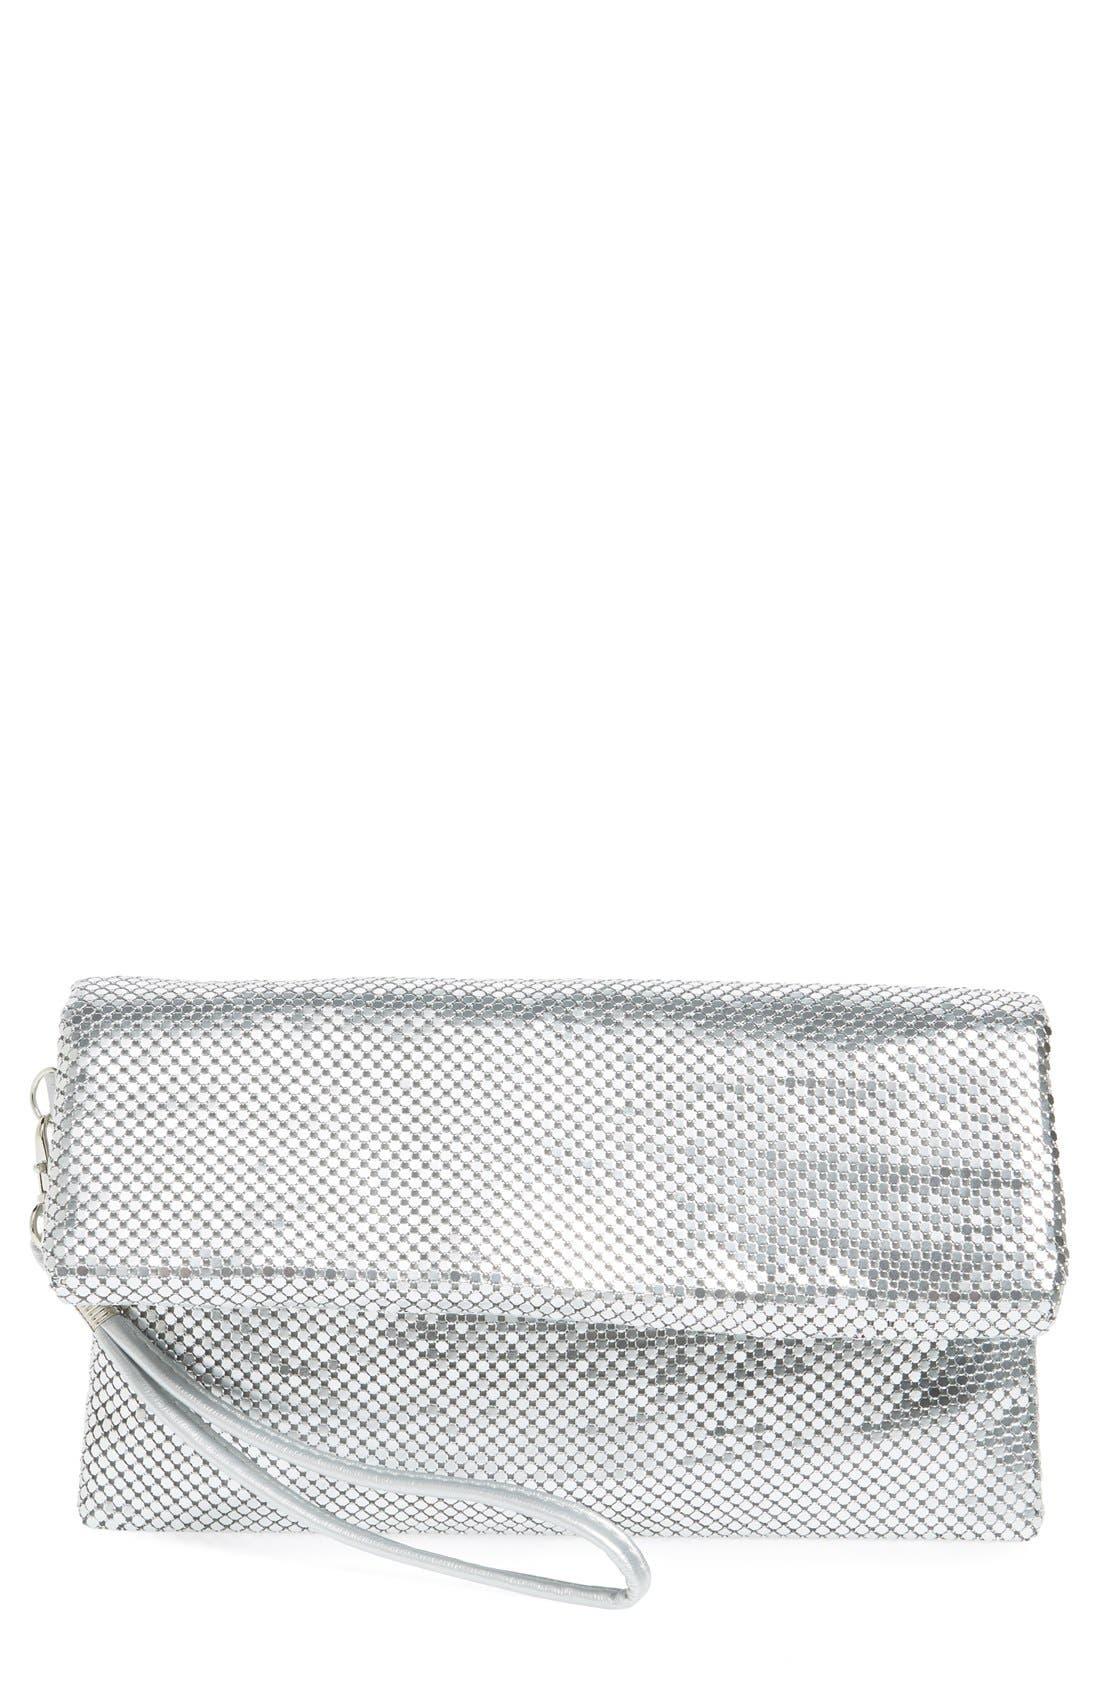 Alternate Image 1 Selected - La Regale Foldover Metal Mesh Clutch